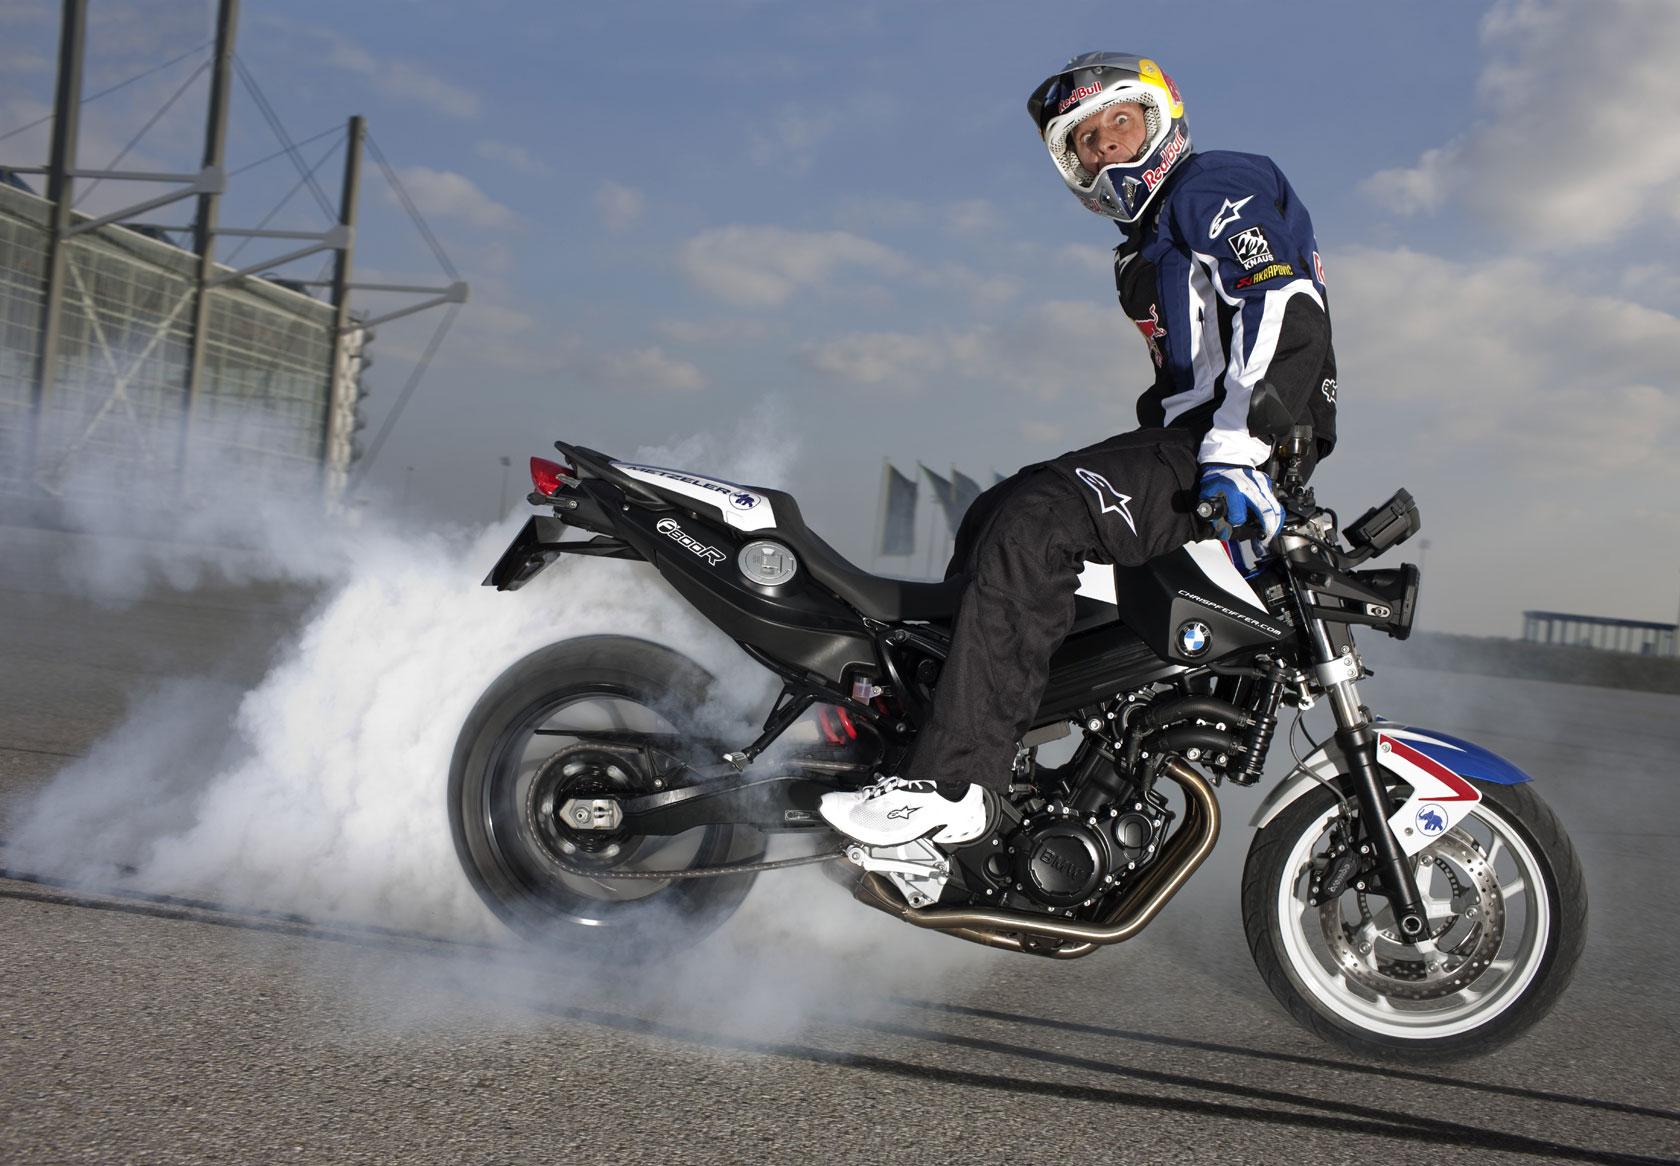 2010 BMW F800R Chris Pfeiffer Edition burnout smoke ...